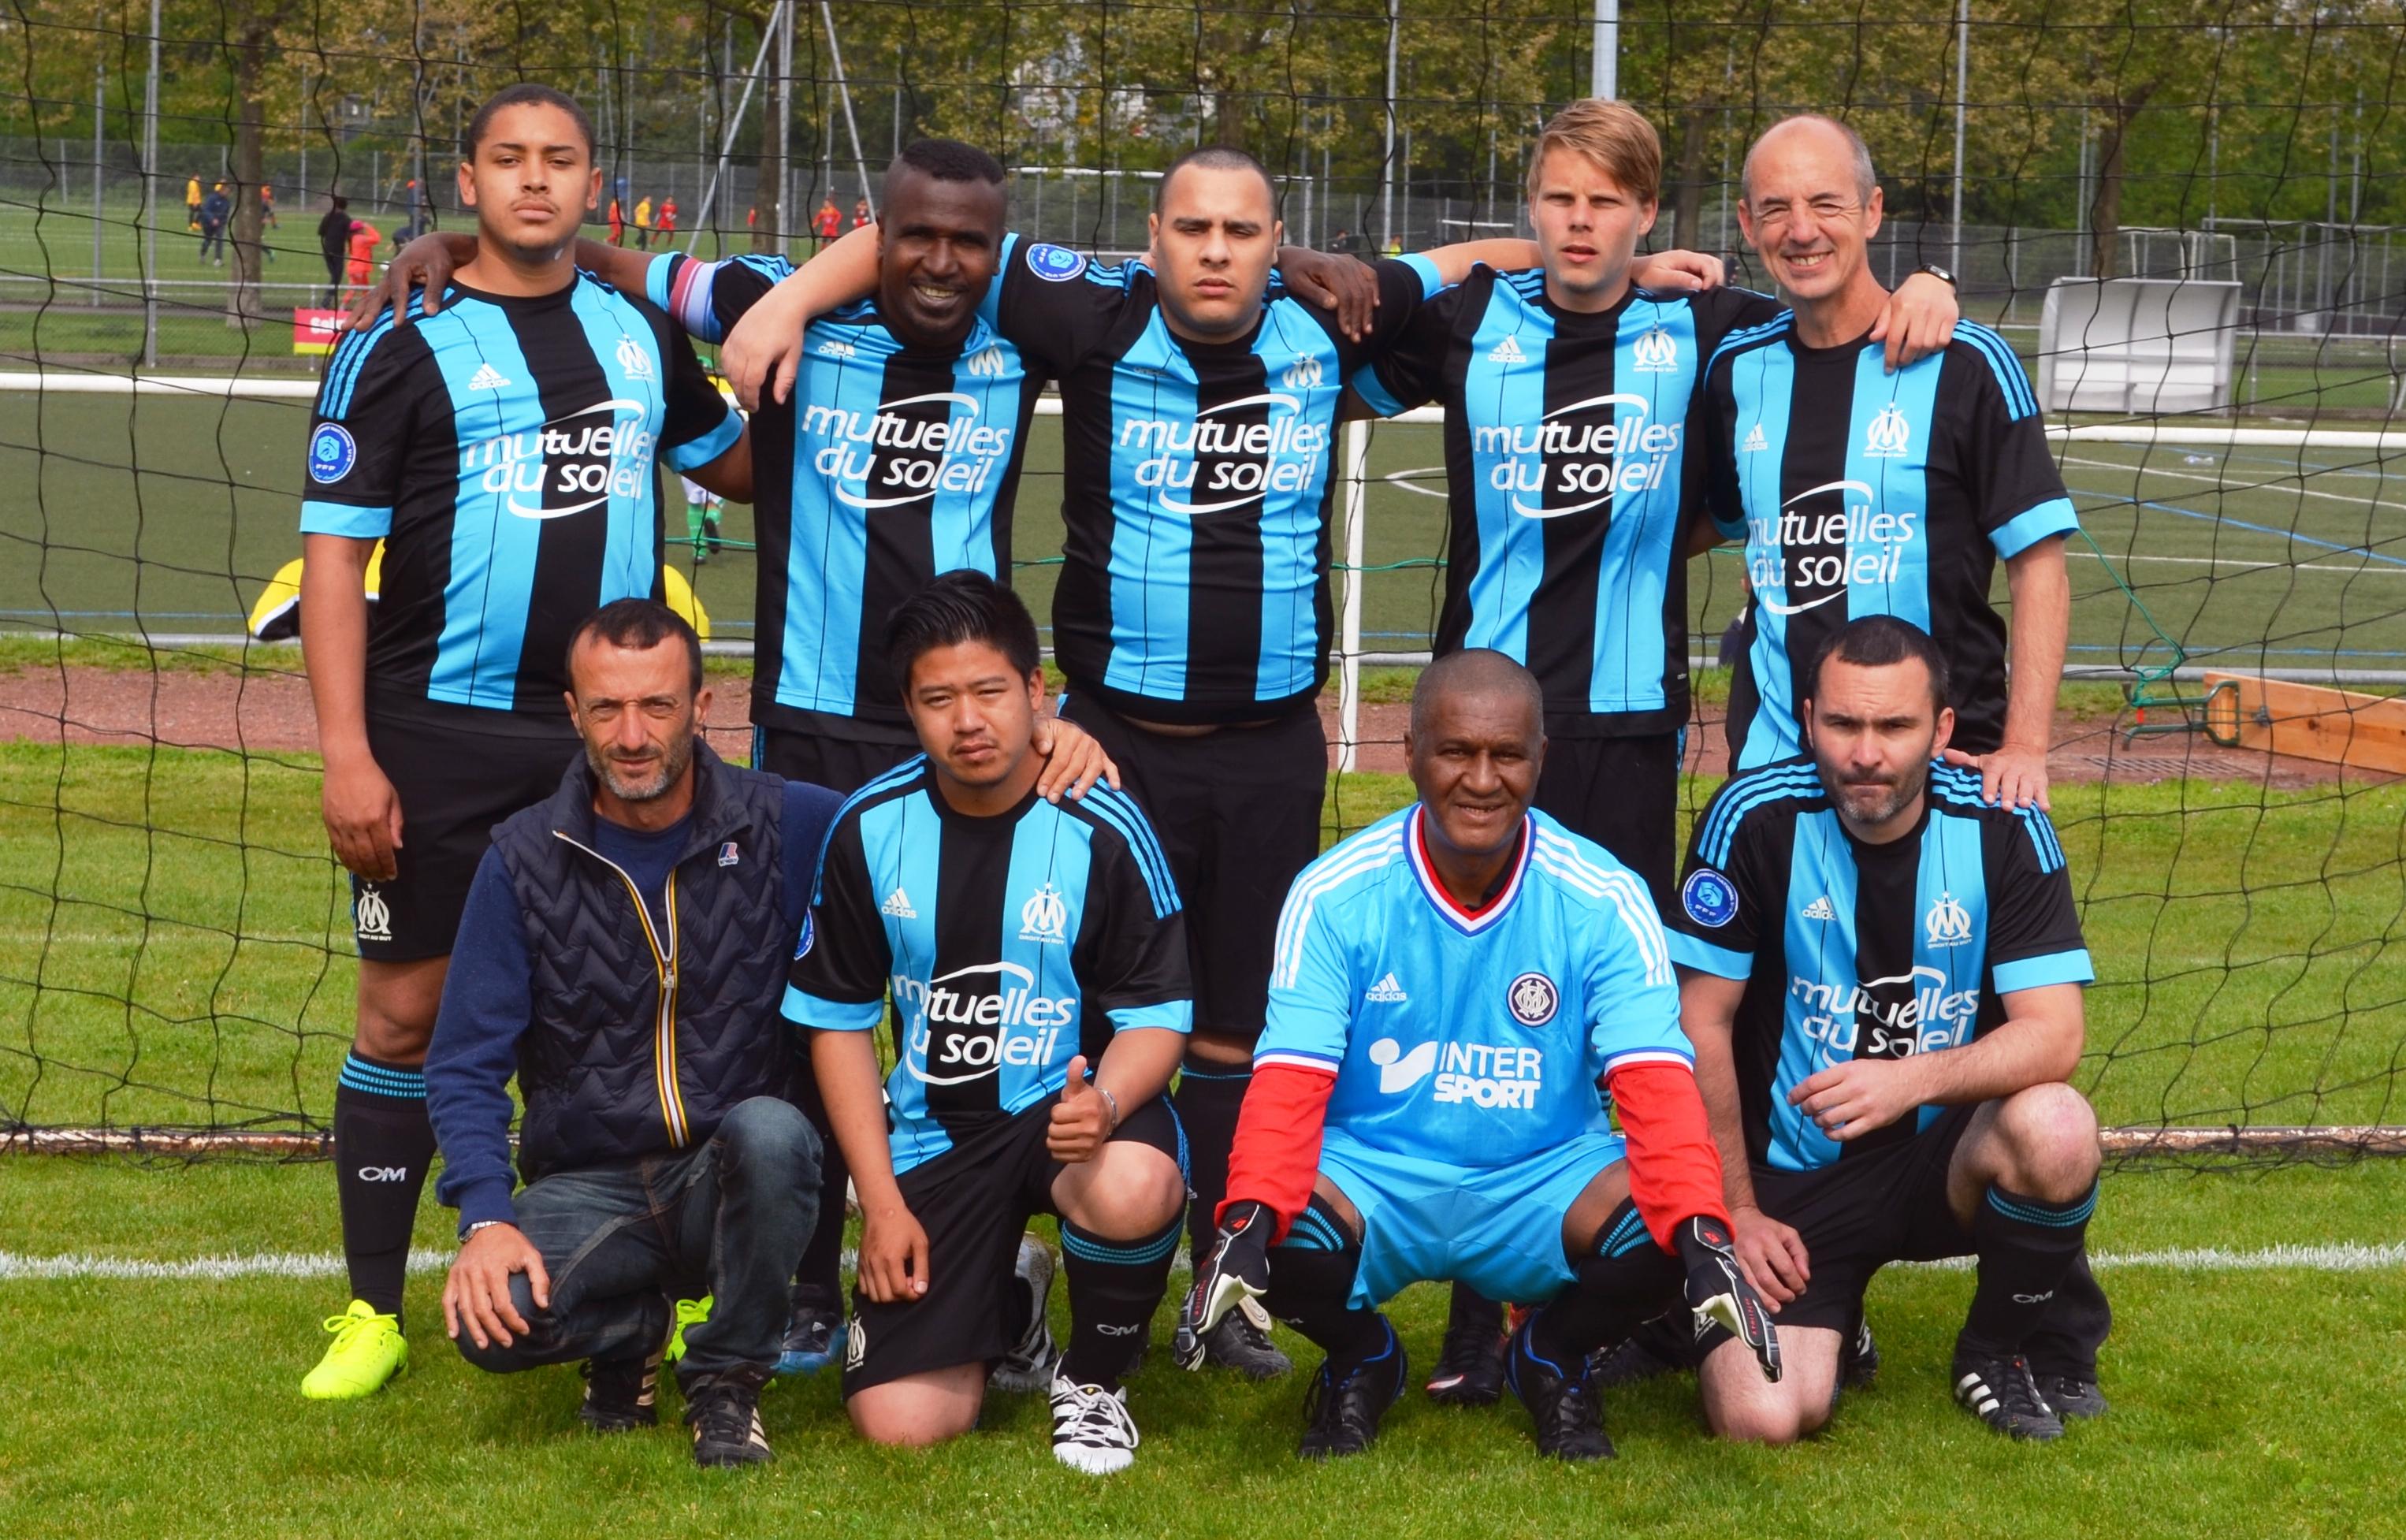 Tournoi national de football de supporters handicapes